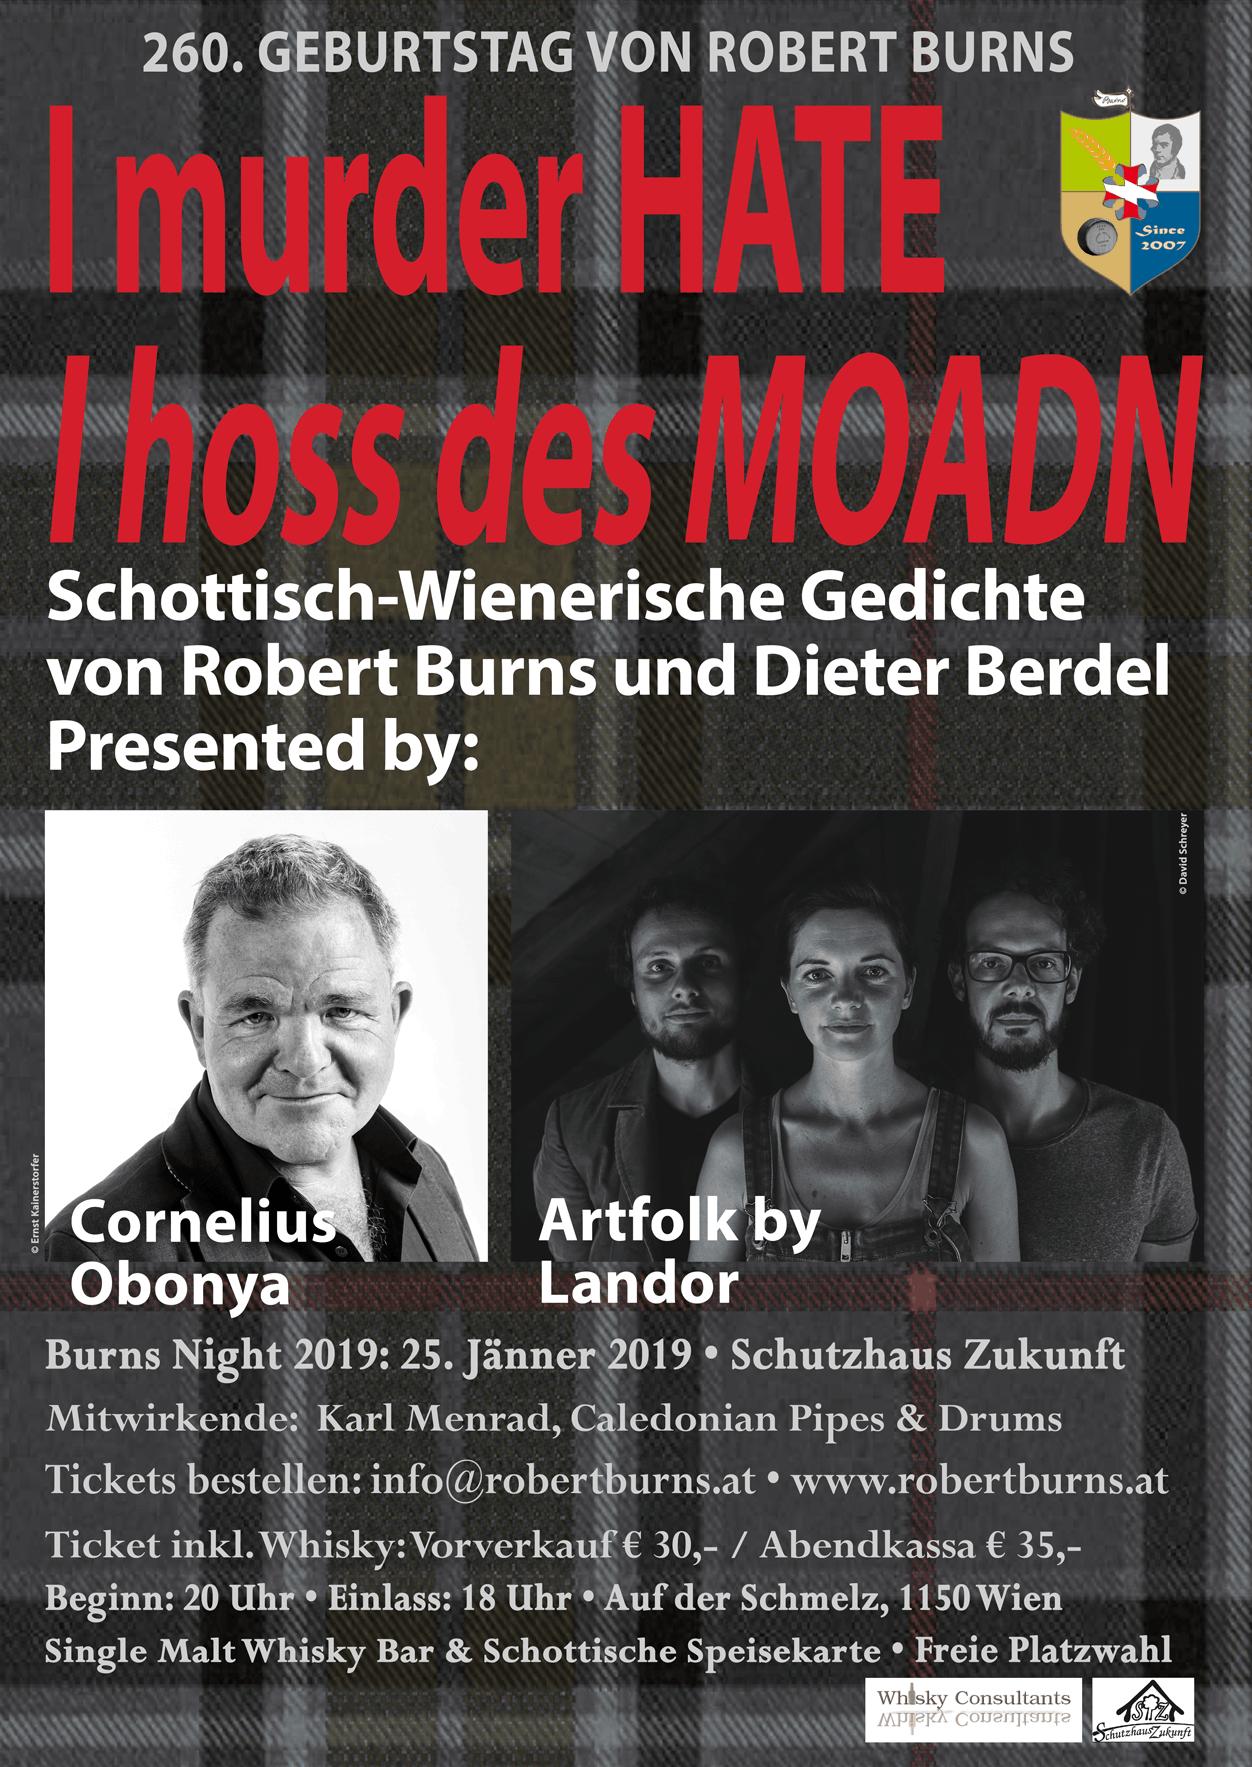 Die Robert Burns Society Austria